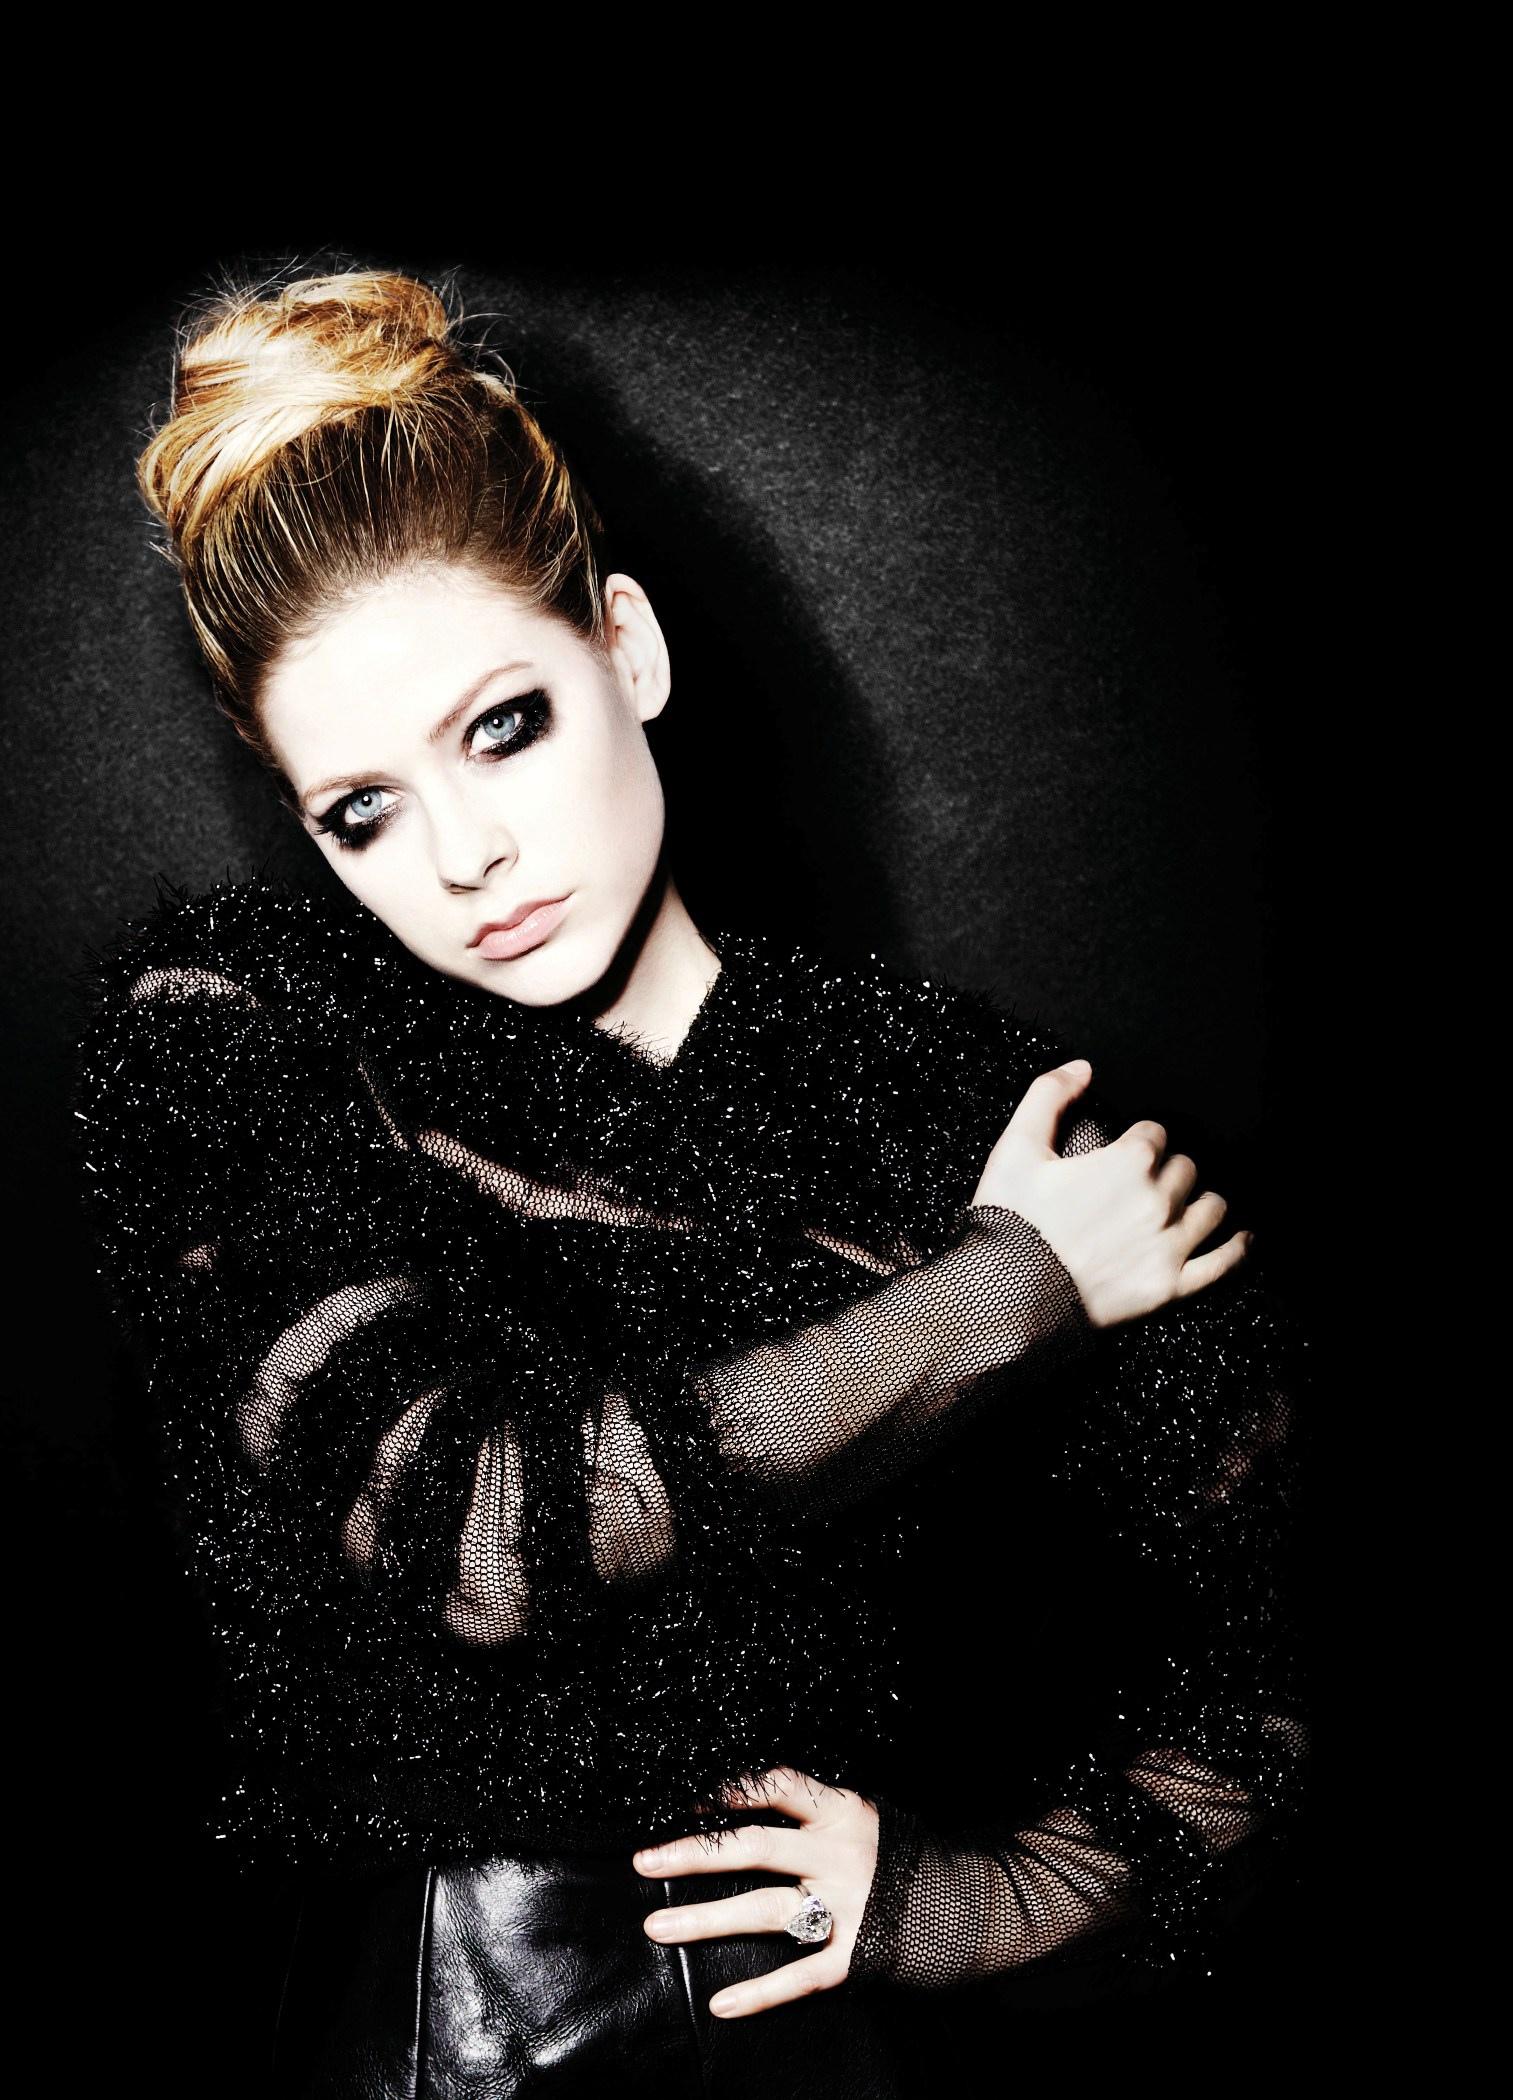 Avril Lavigne Avril-Lavigne-image-avril-lavigne-36212987-1513-2100